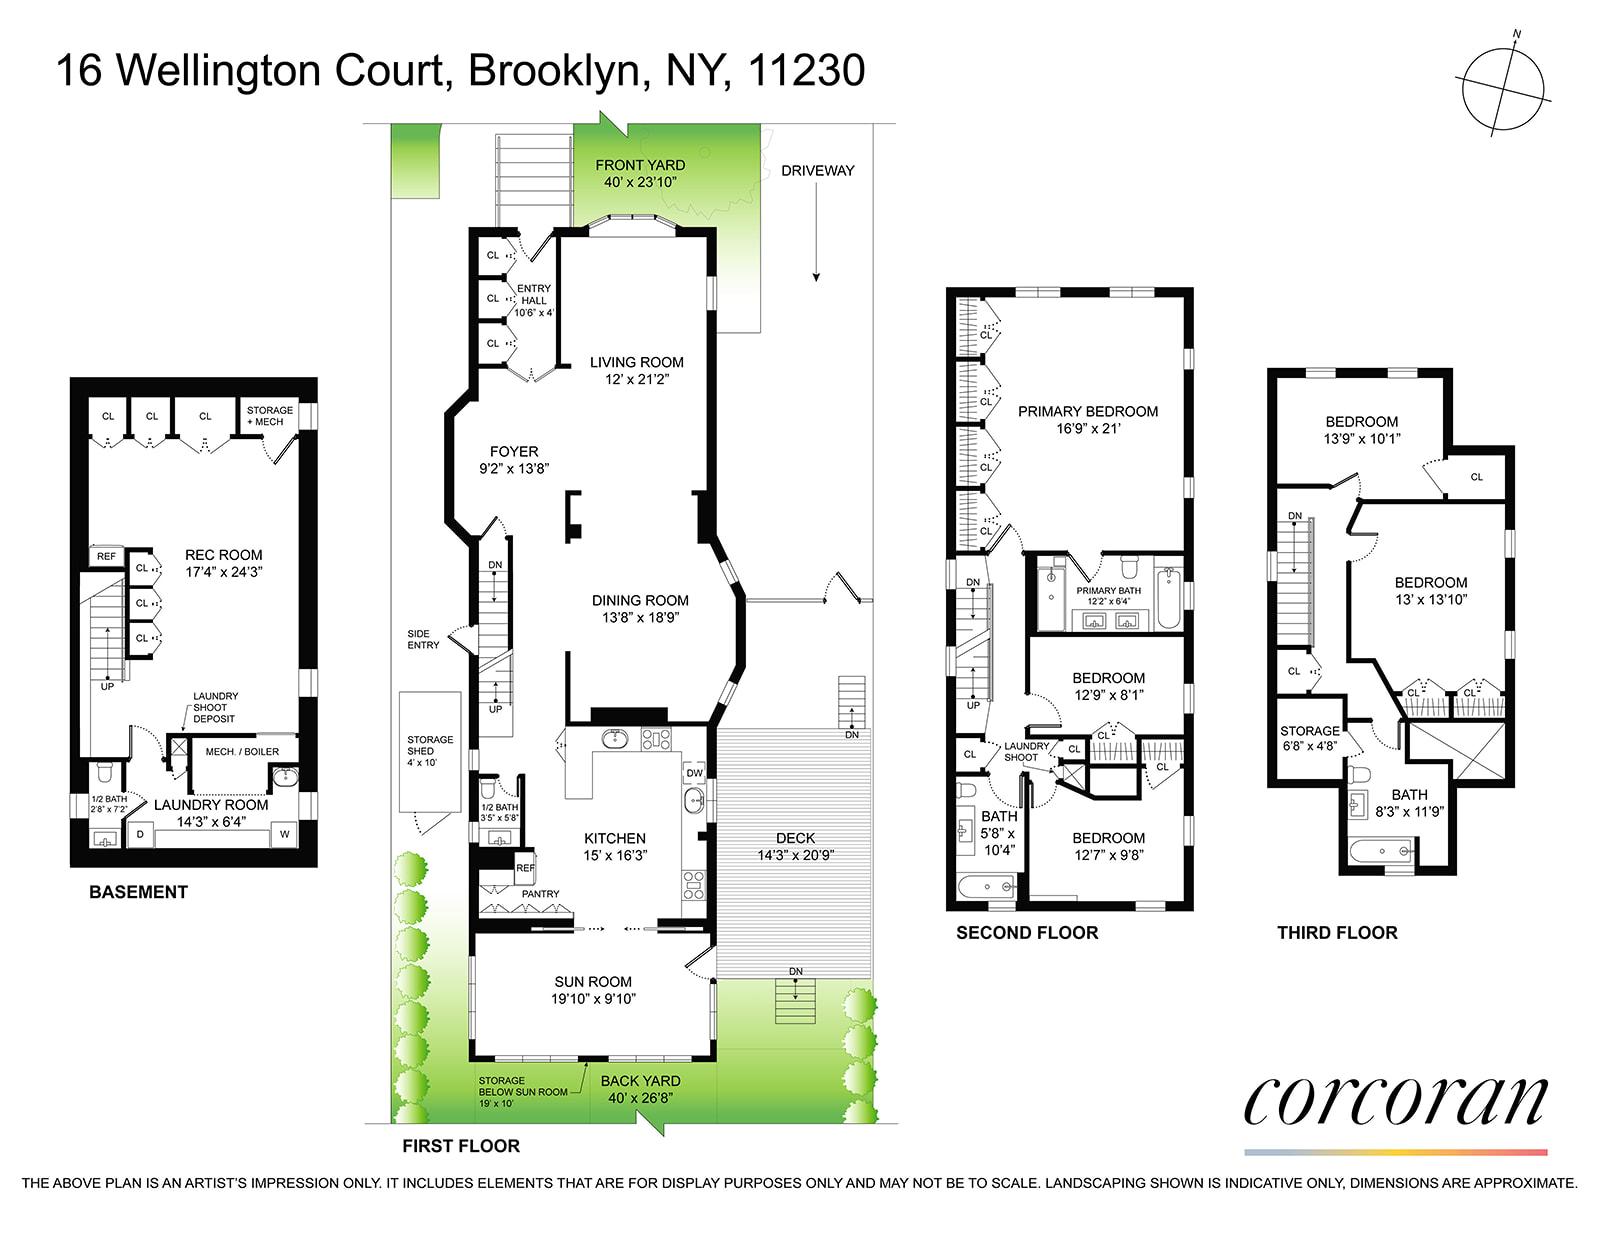 16 Wellington Court Midwood Brooklyn NY 11230